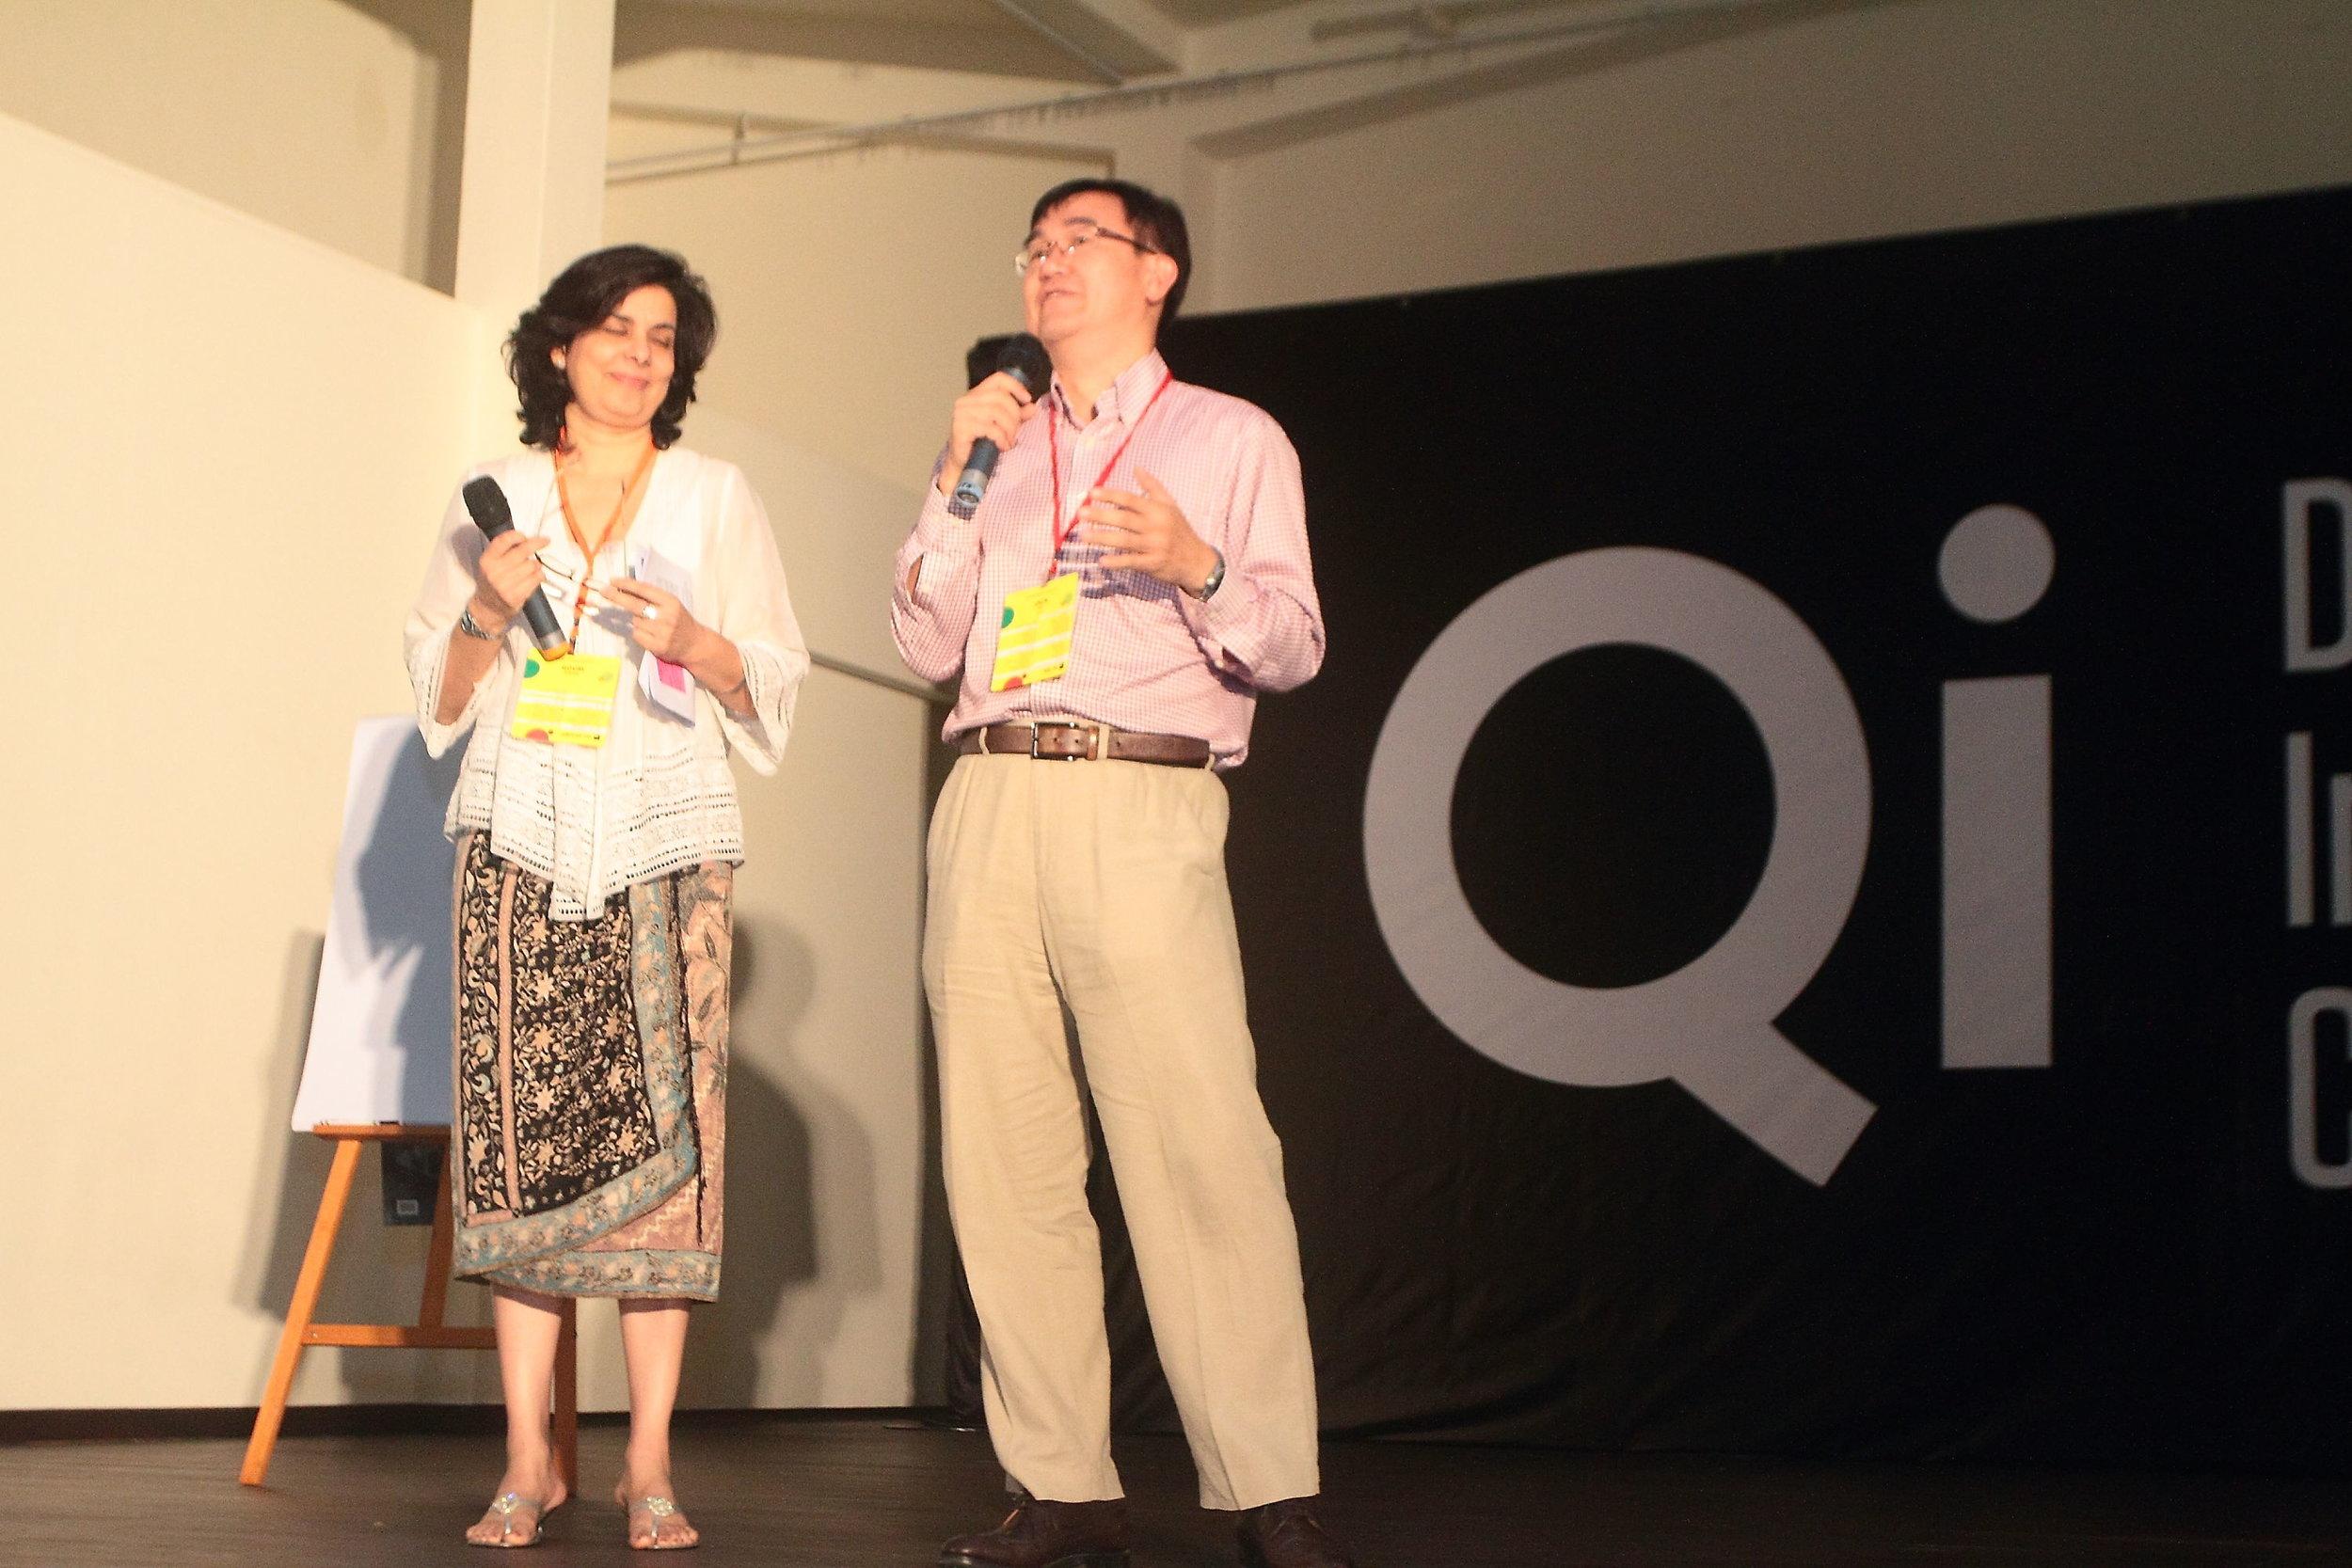 qi-global-2011-driving-innovation-culture-064.jpg